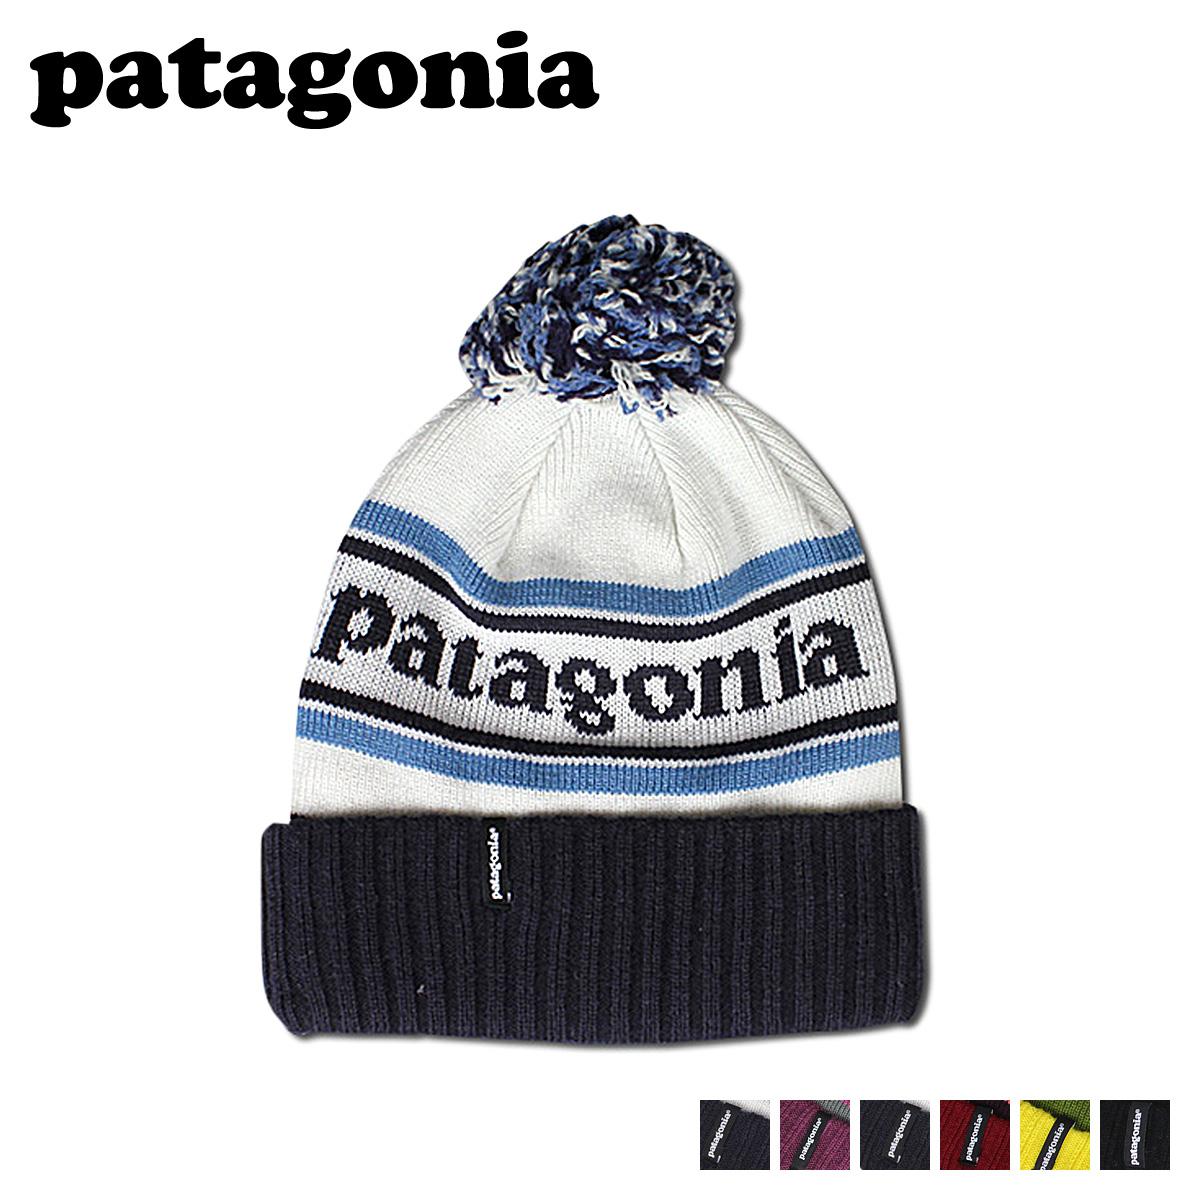 Sugar Online Shop  Patagonia patagonia knitted Cap 29185 Powder Town Beanie  nylon mens Womens FALL 2013 new  f994f260f9